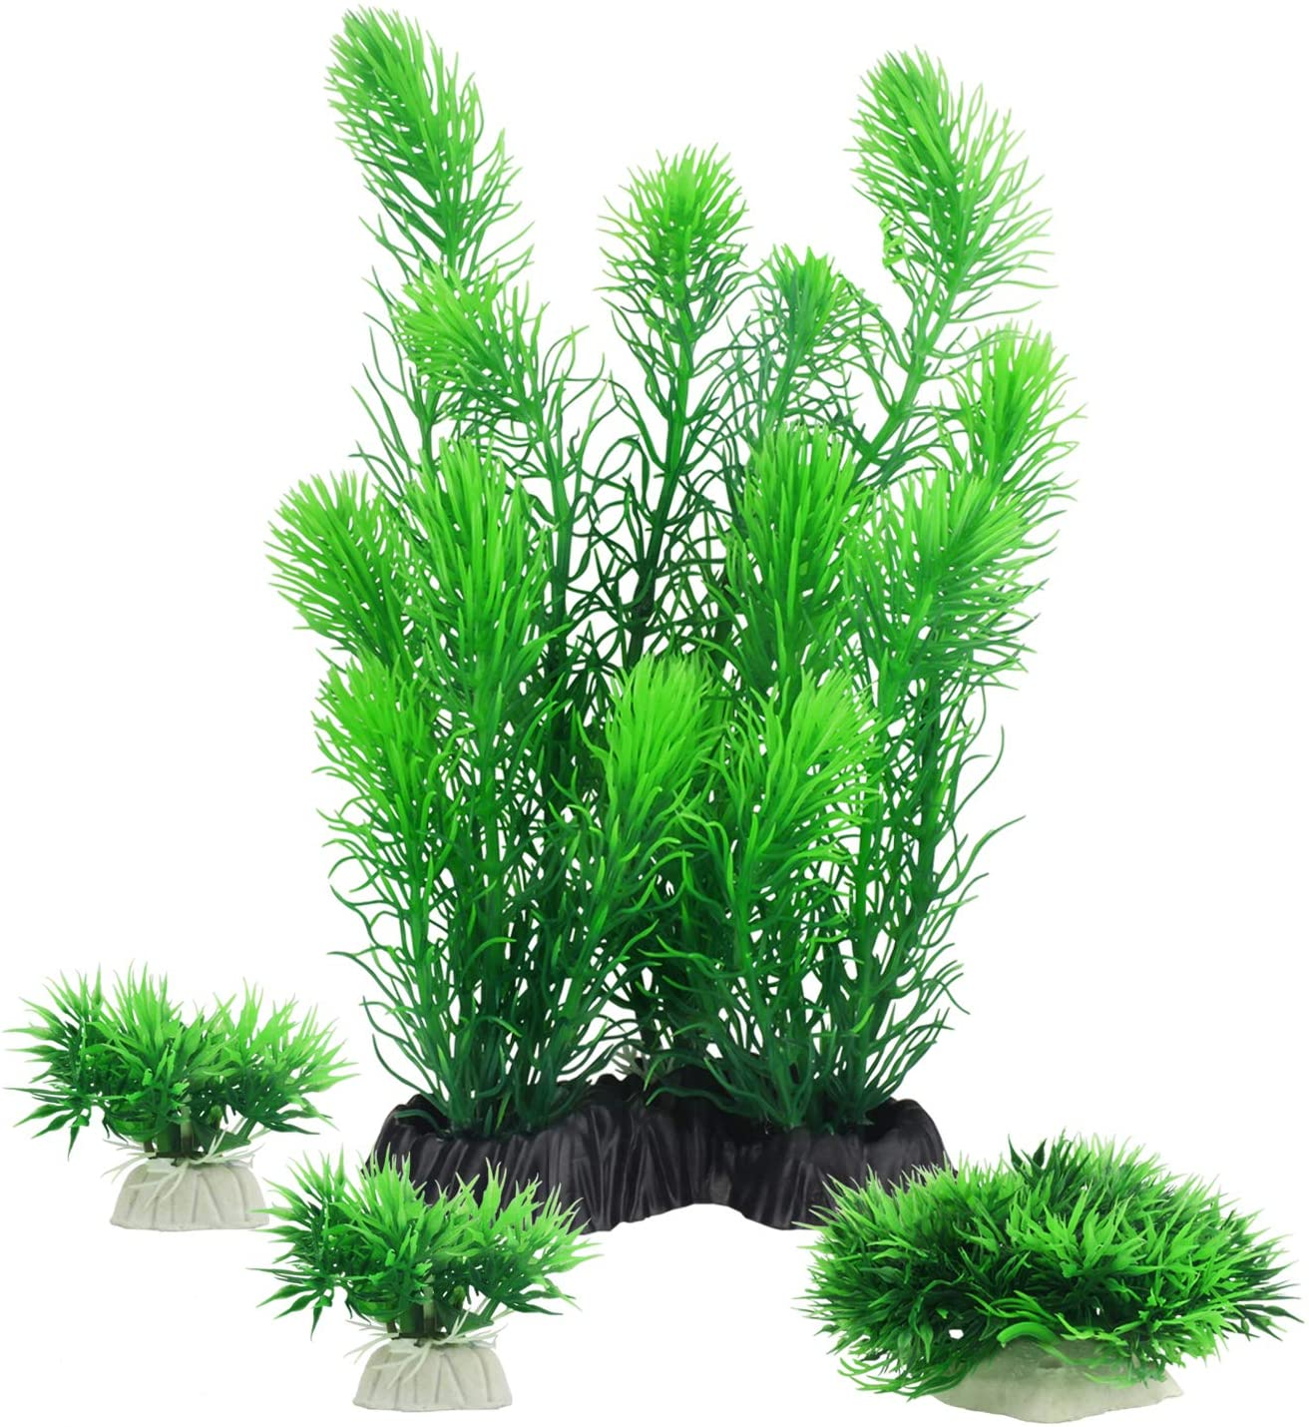 MyLifeUNIT Aquariums Decorations Plants, Artificial Aquarium Plants for Fish Tank Decor, Pack of 4